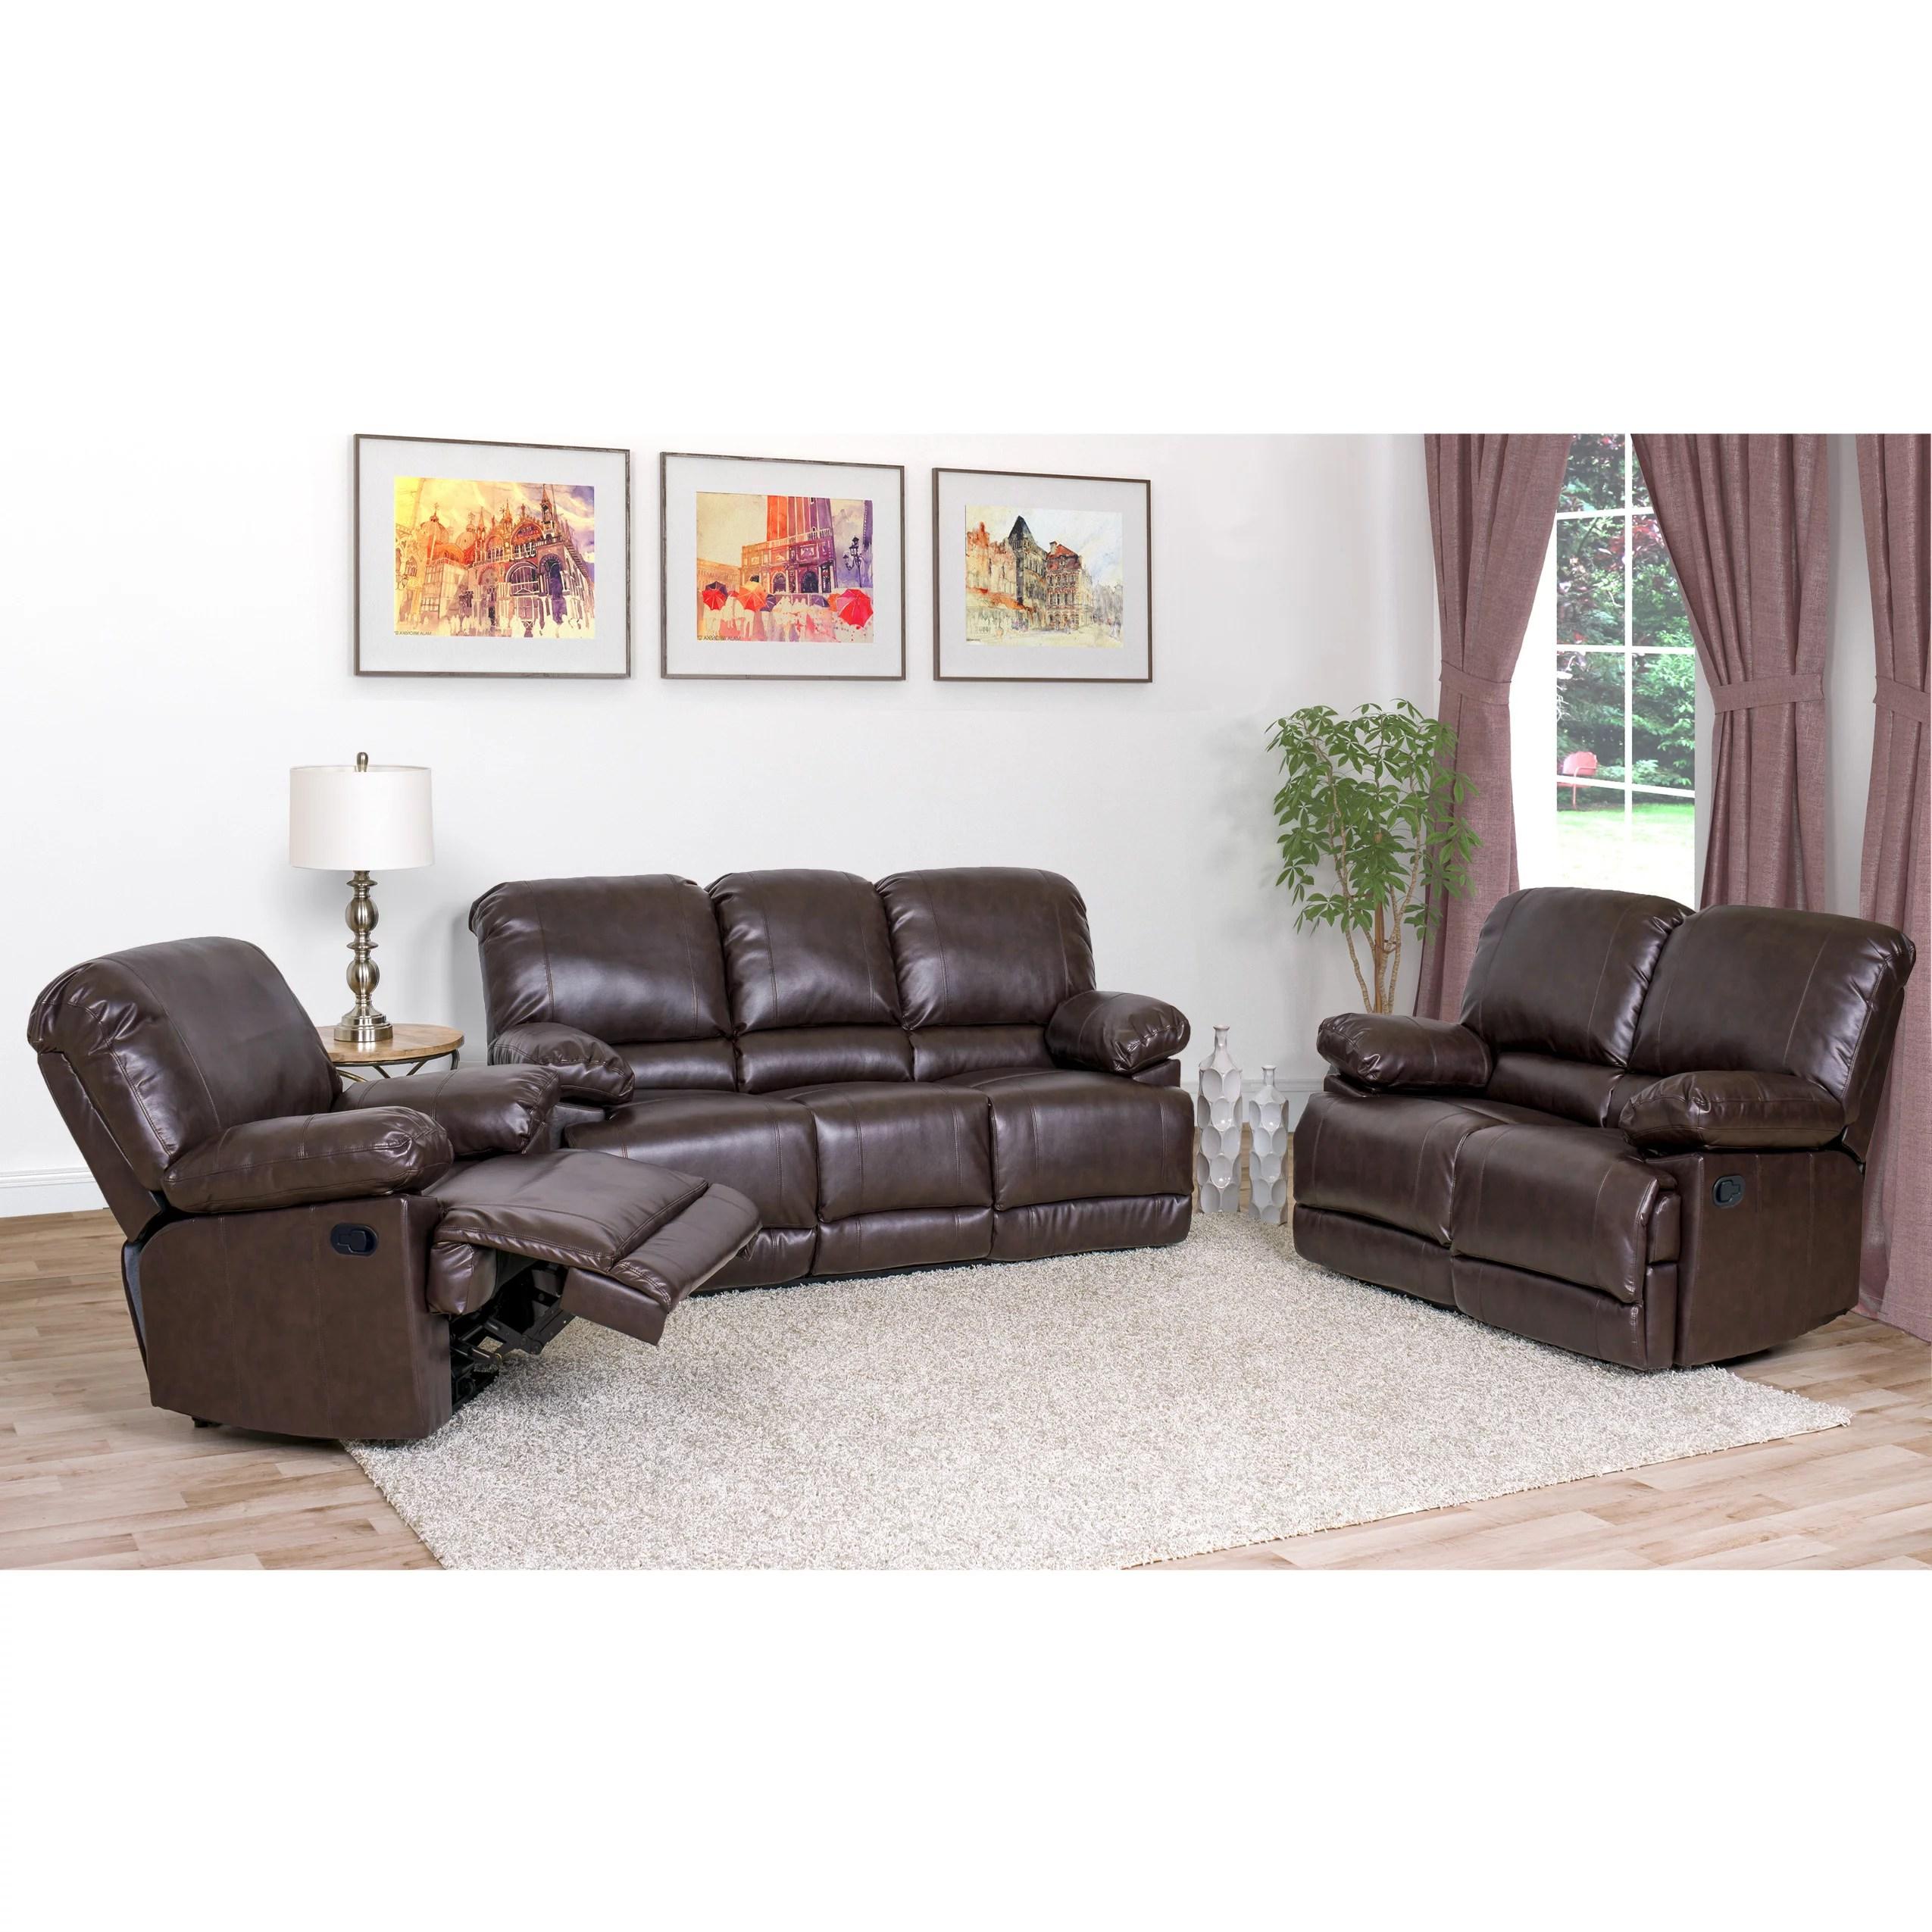 nora brown leather reclining 3 pc living room sofa set sofascore tottenham vs liverpool corliving 3pc bonded walmart